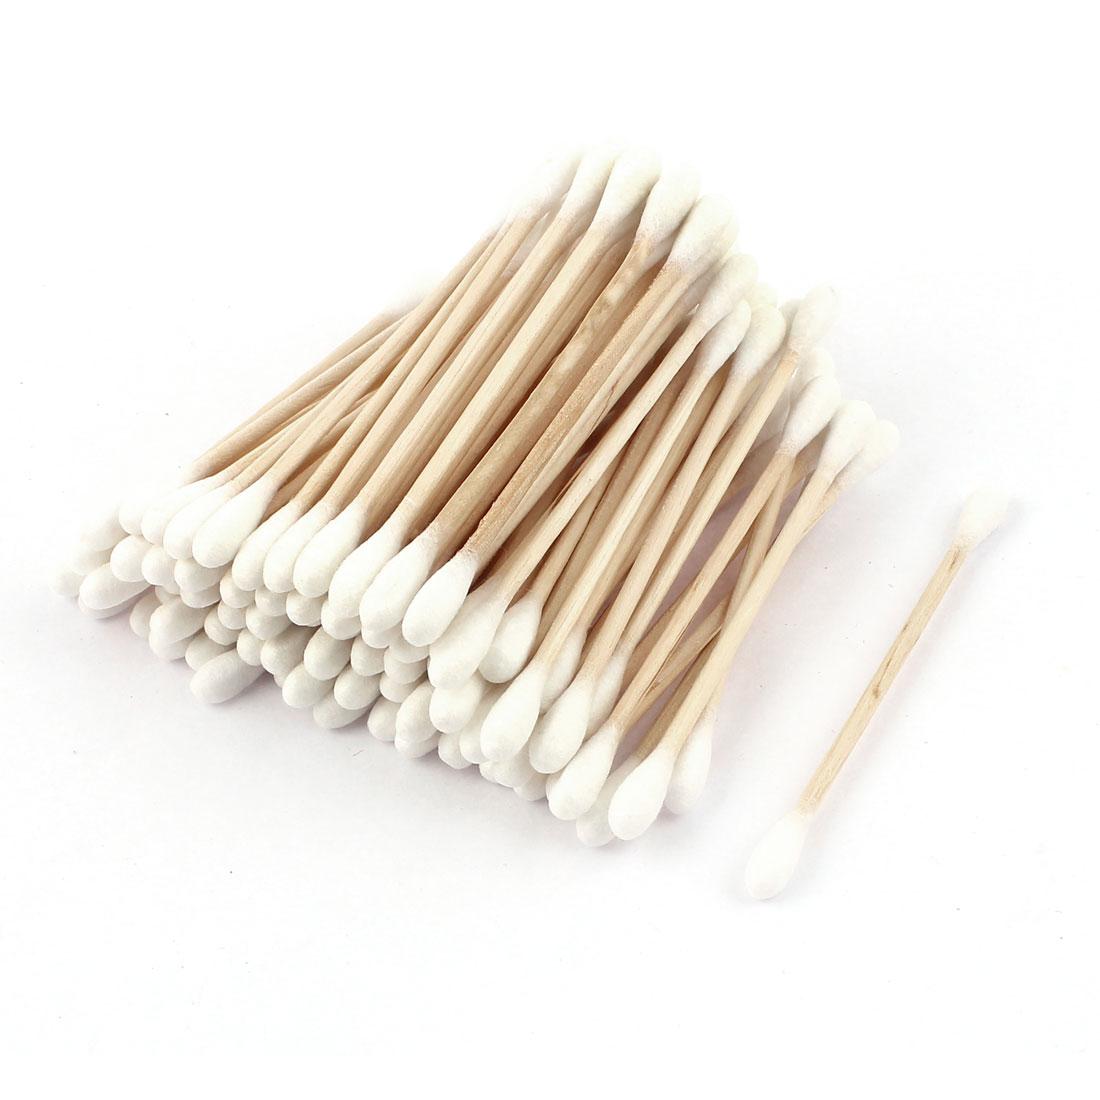 100pcs Wood Rod Double Ended Cotton Swab Bud Ear Picks Applicators Cosmetics Makeup Tool